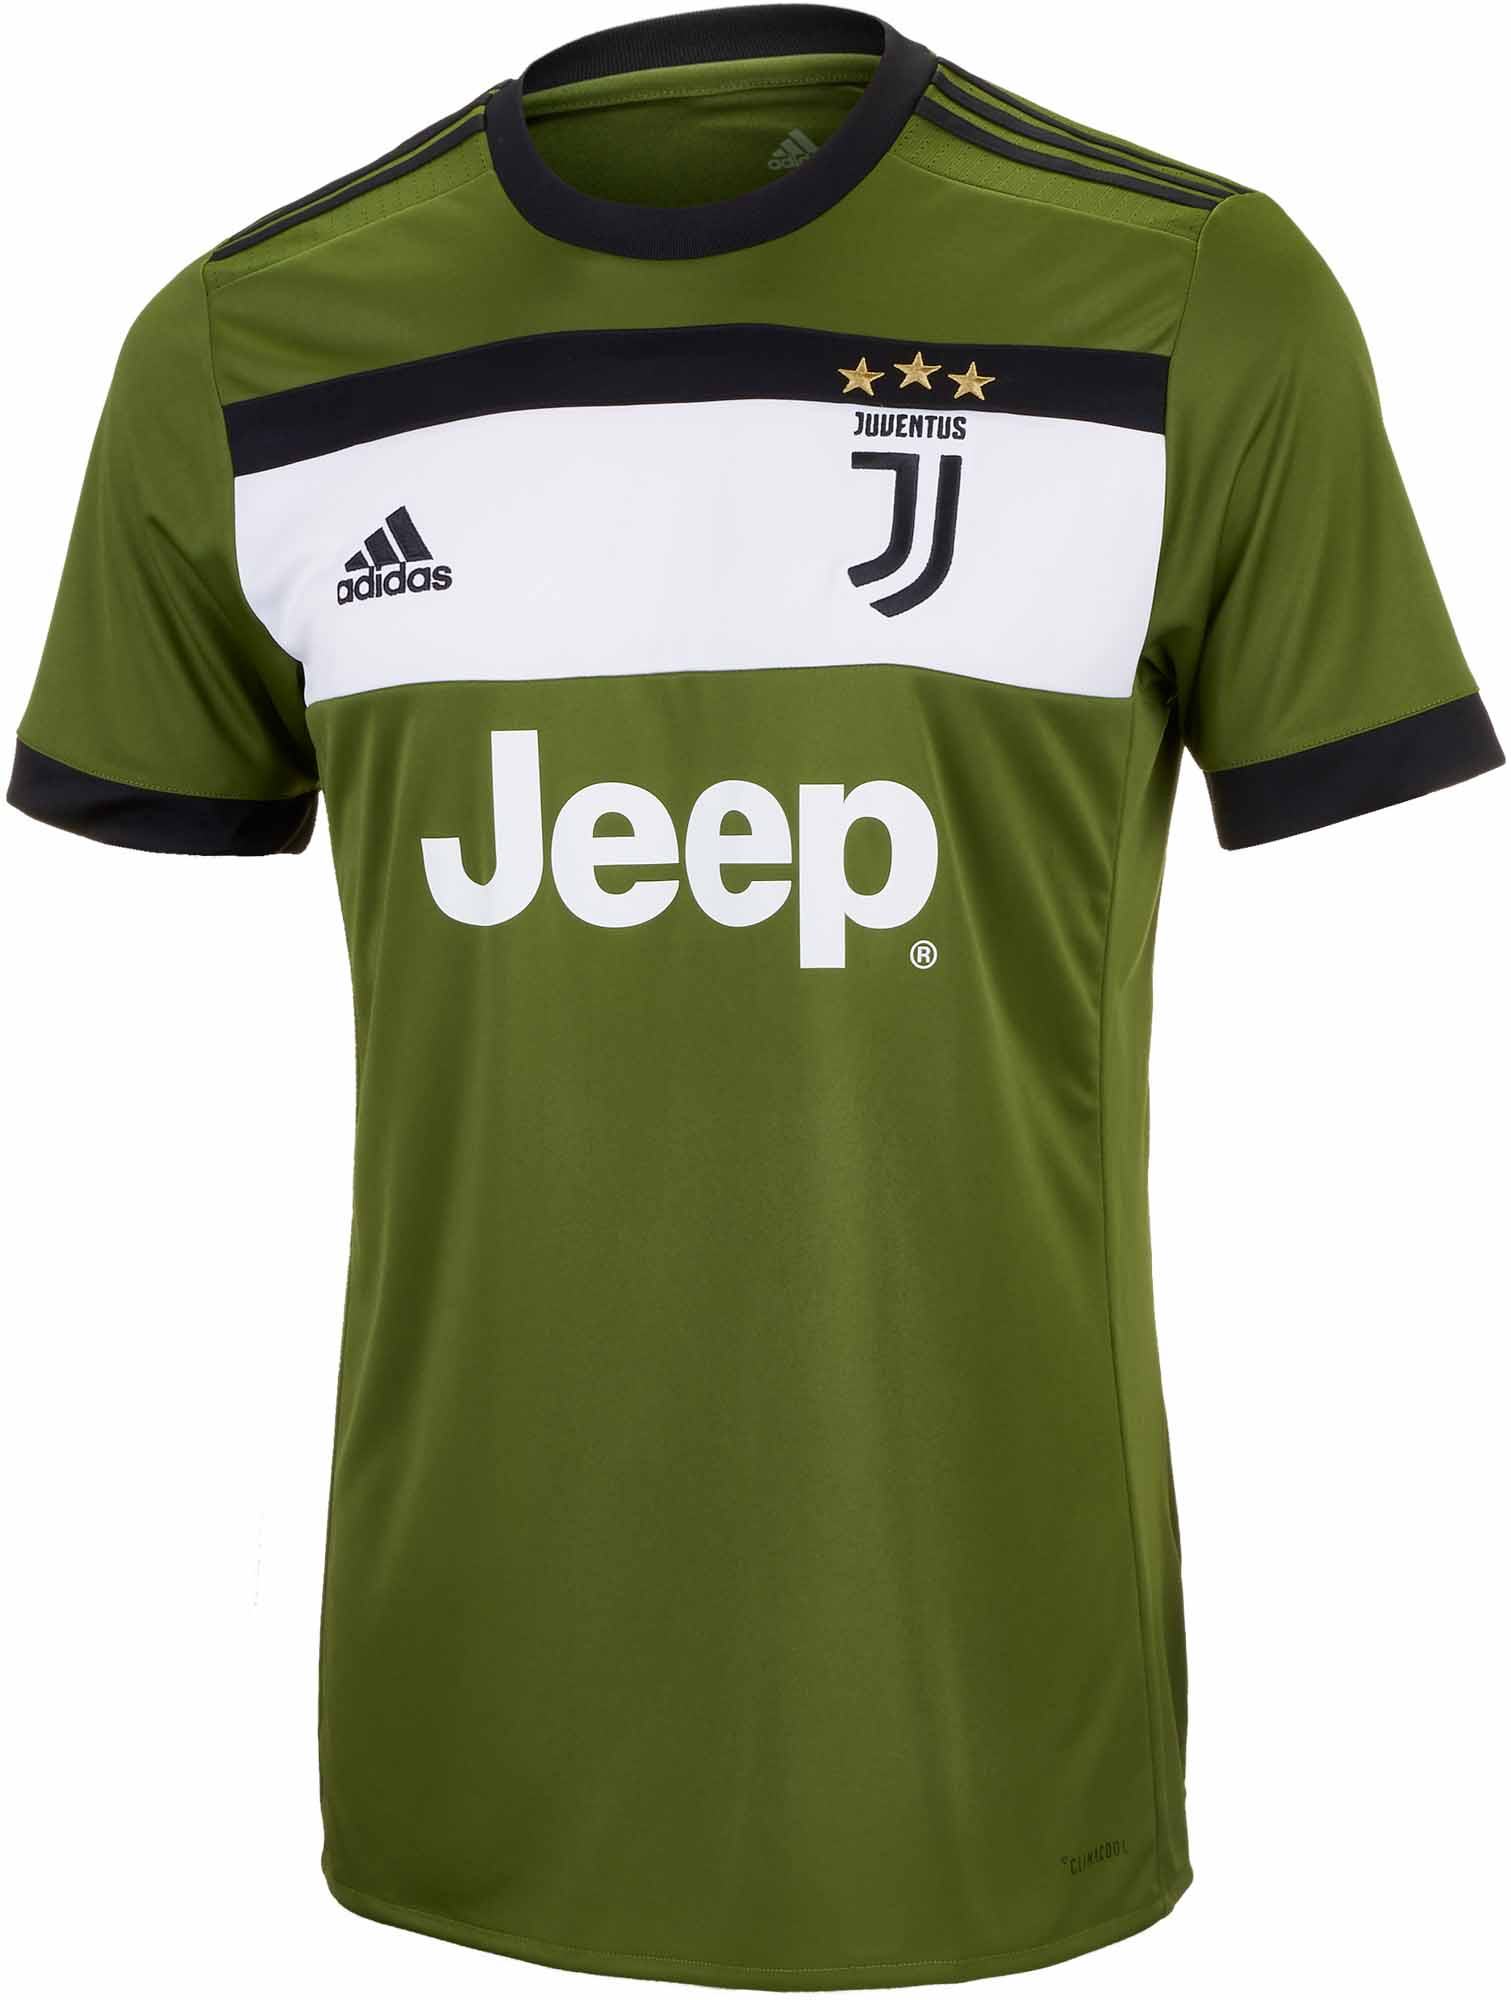 adidas Juventus 3rd Jersey 2017-18 NS - Soccer Master 1e90a3203